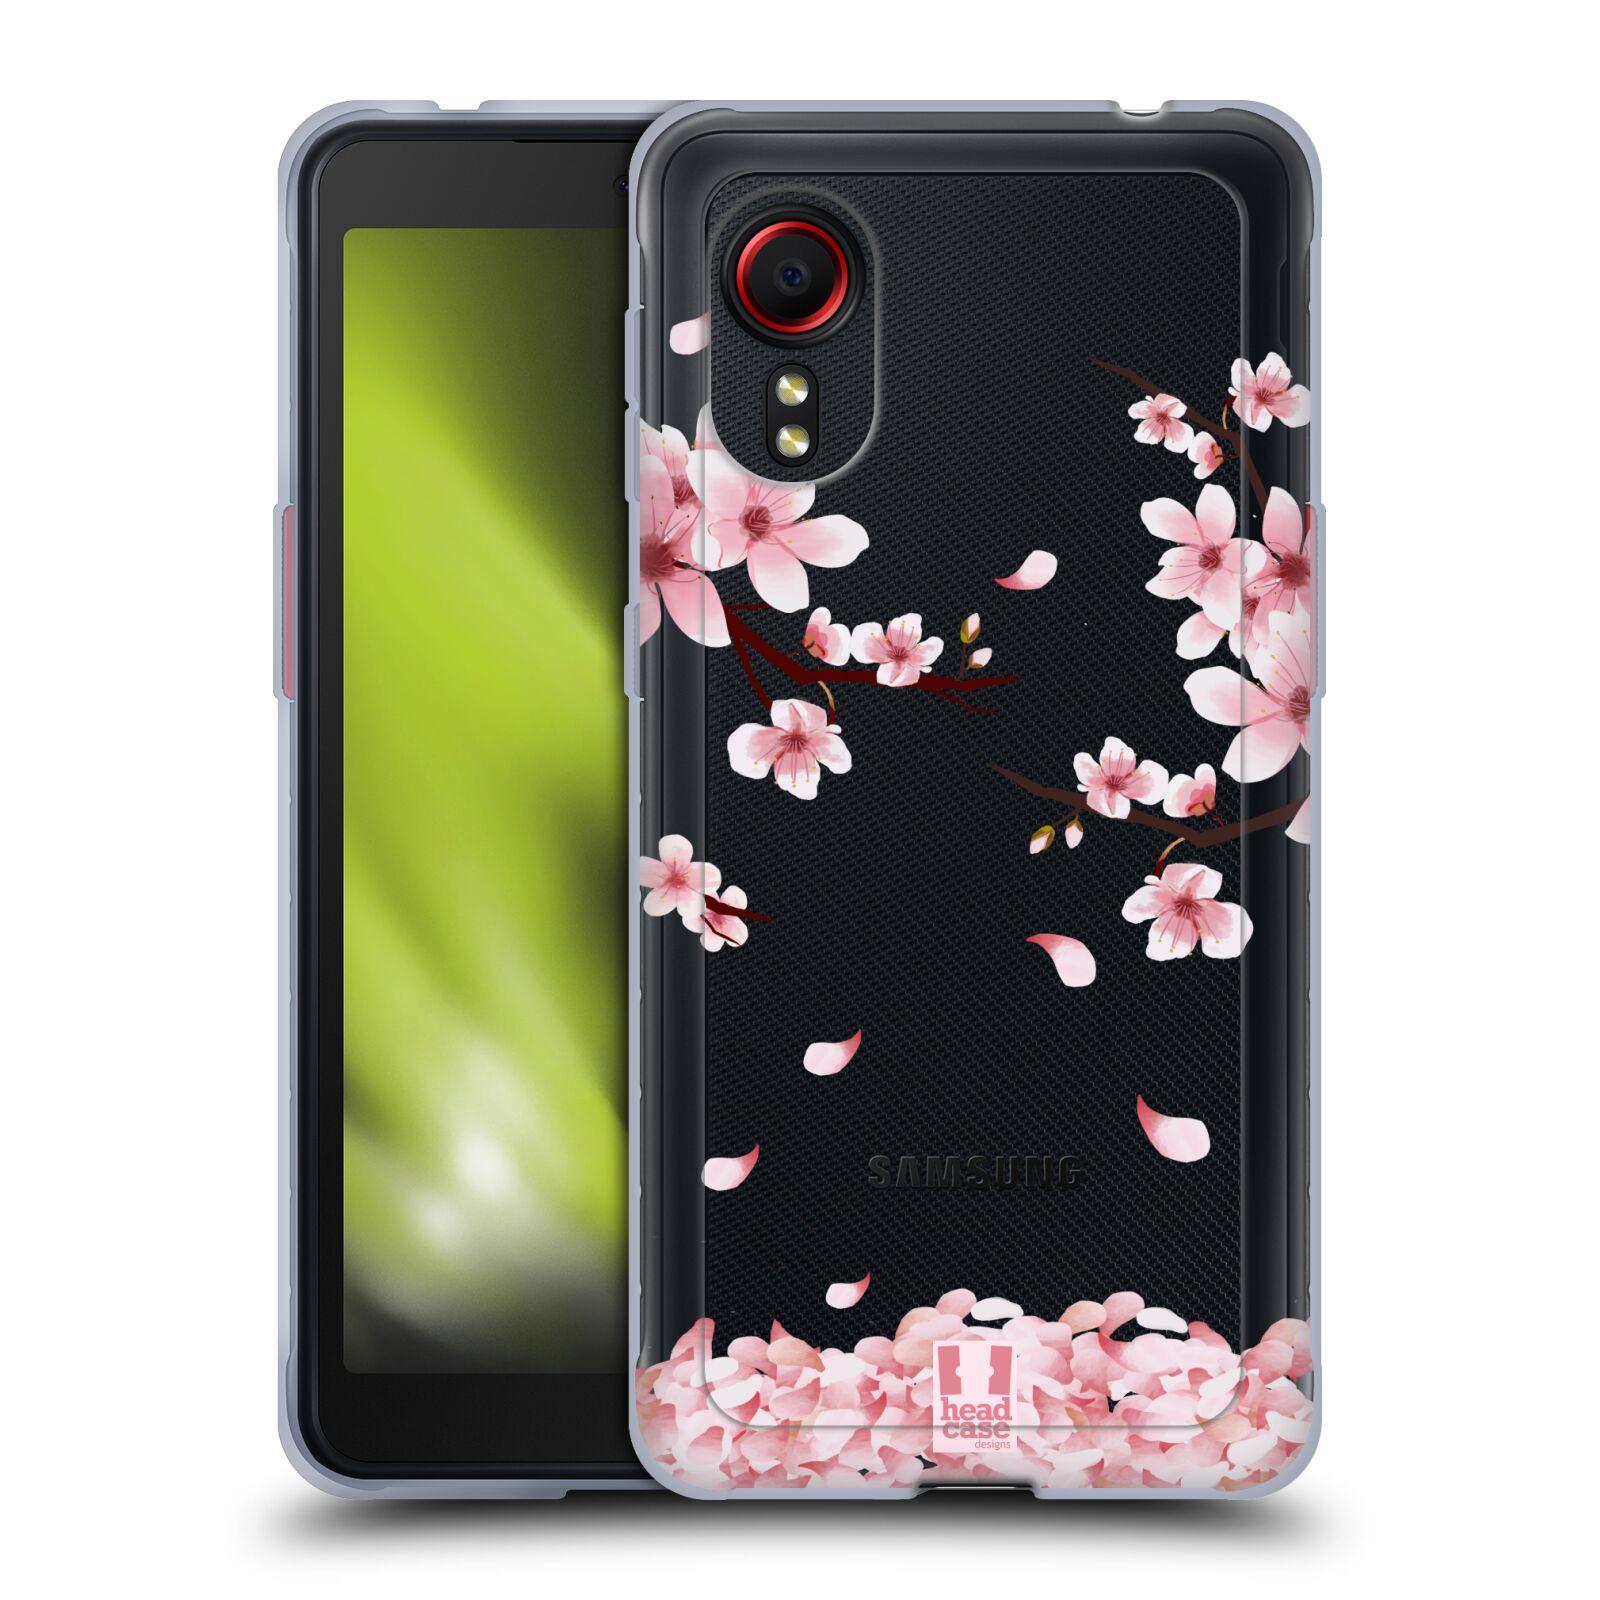 Silikonové pouzdro na mobil Samsung Galaxy Xcover 5 - Head Case - Květy a větvičky